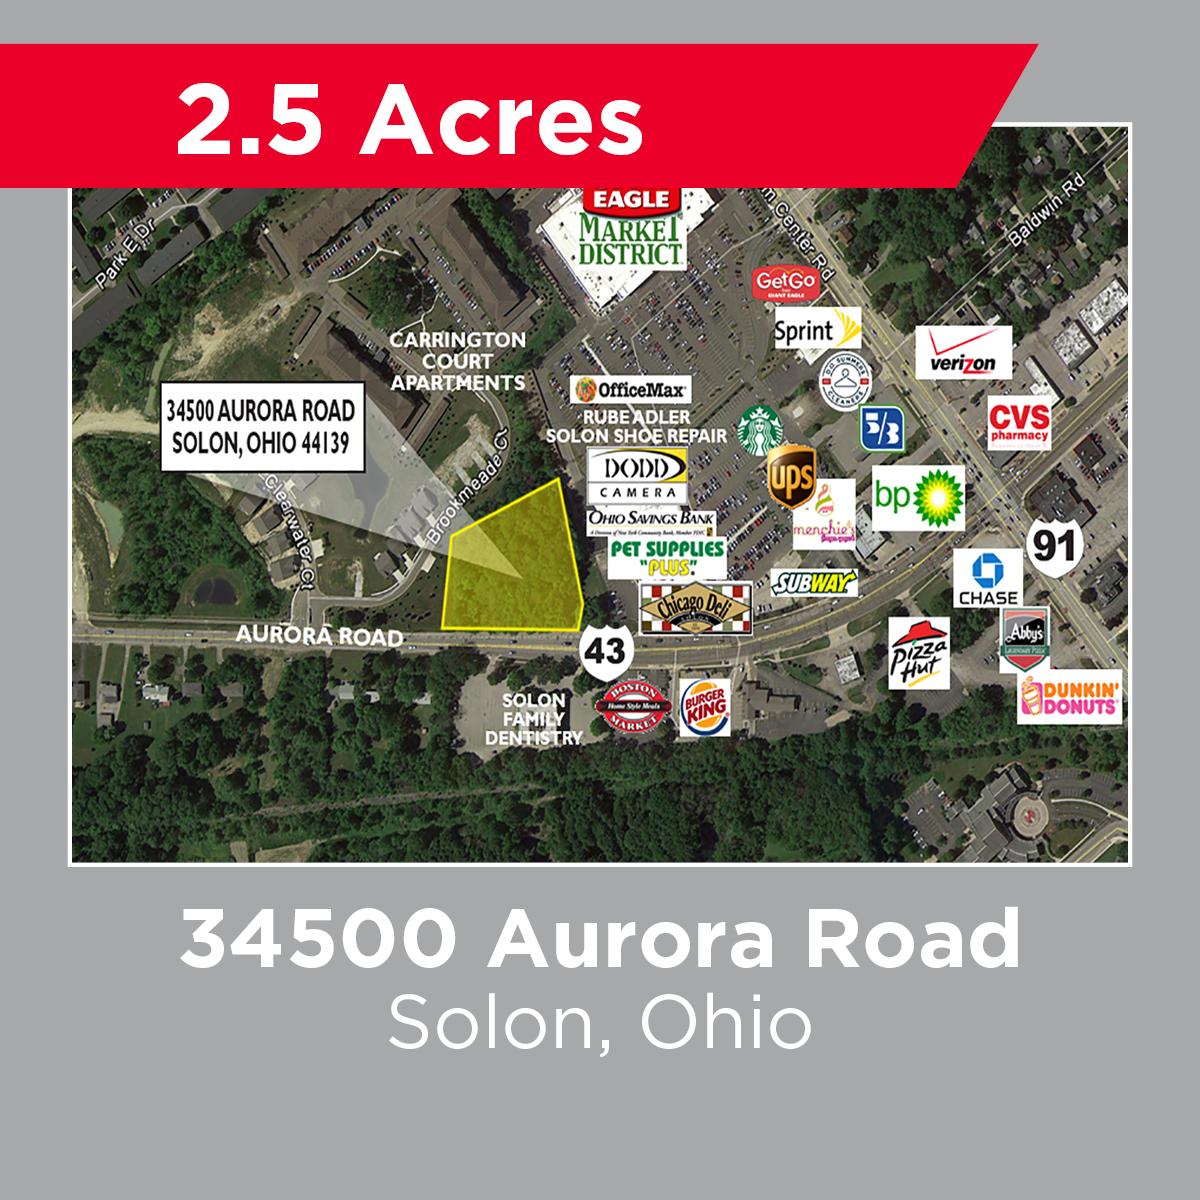 34500 Aurora Road.jpg